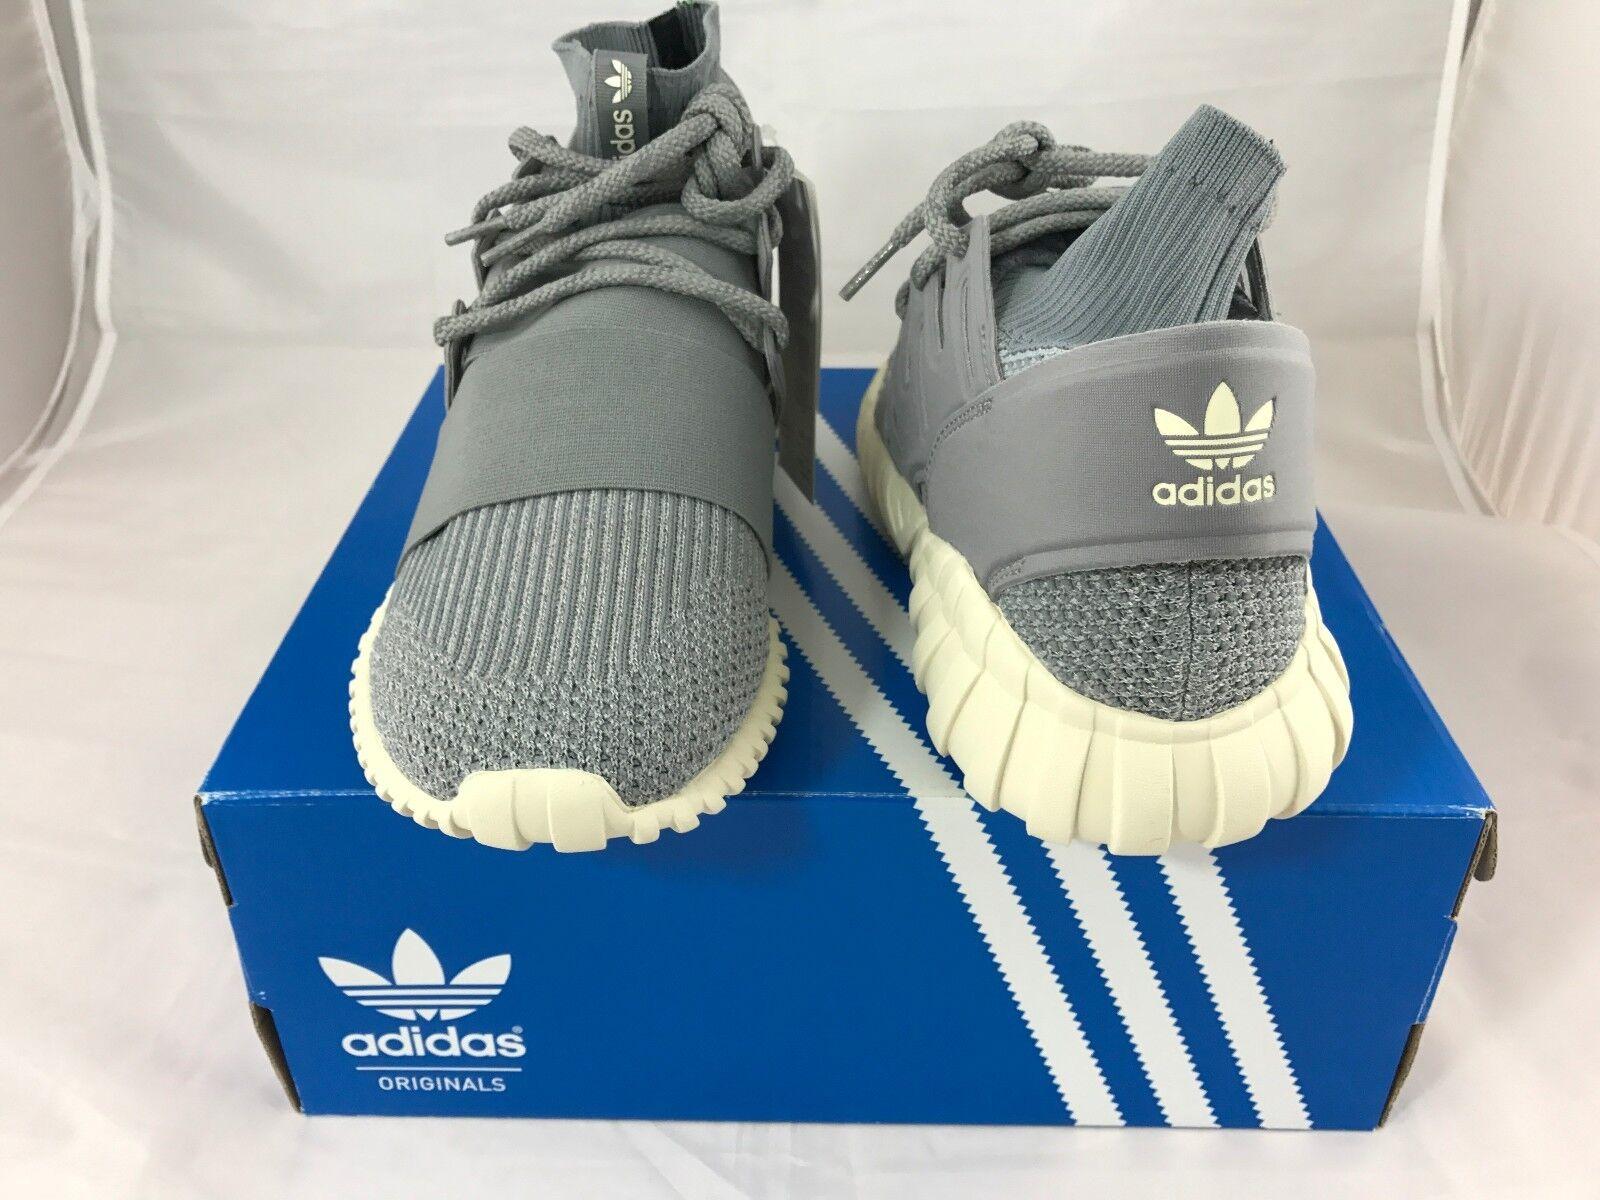 Adidas Originals Tubular Doom Primeknit Mens zapatos zapatos zapatos Trainers gris a3ccfc